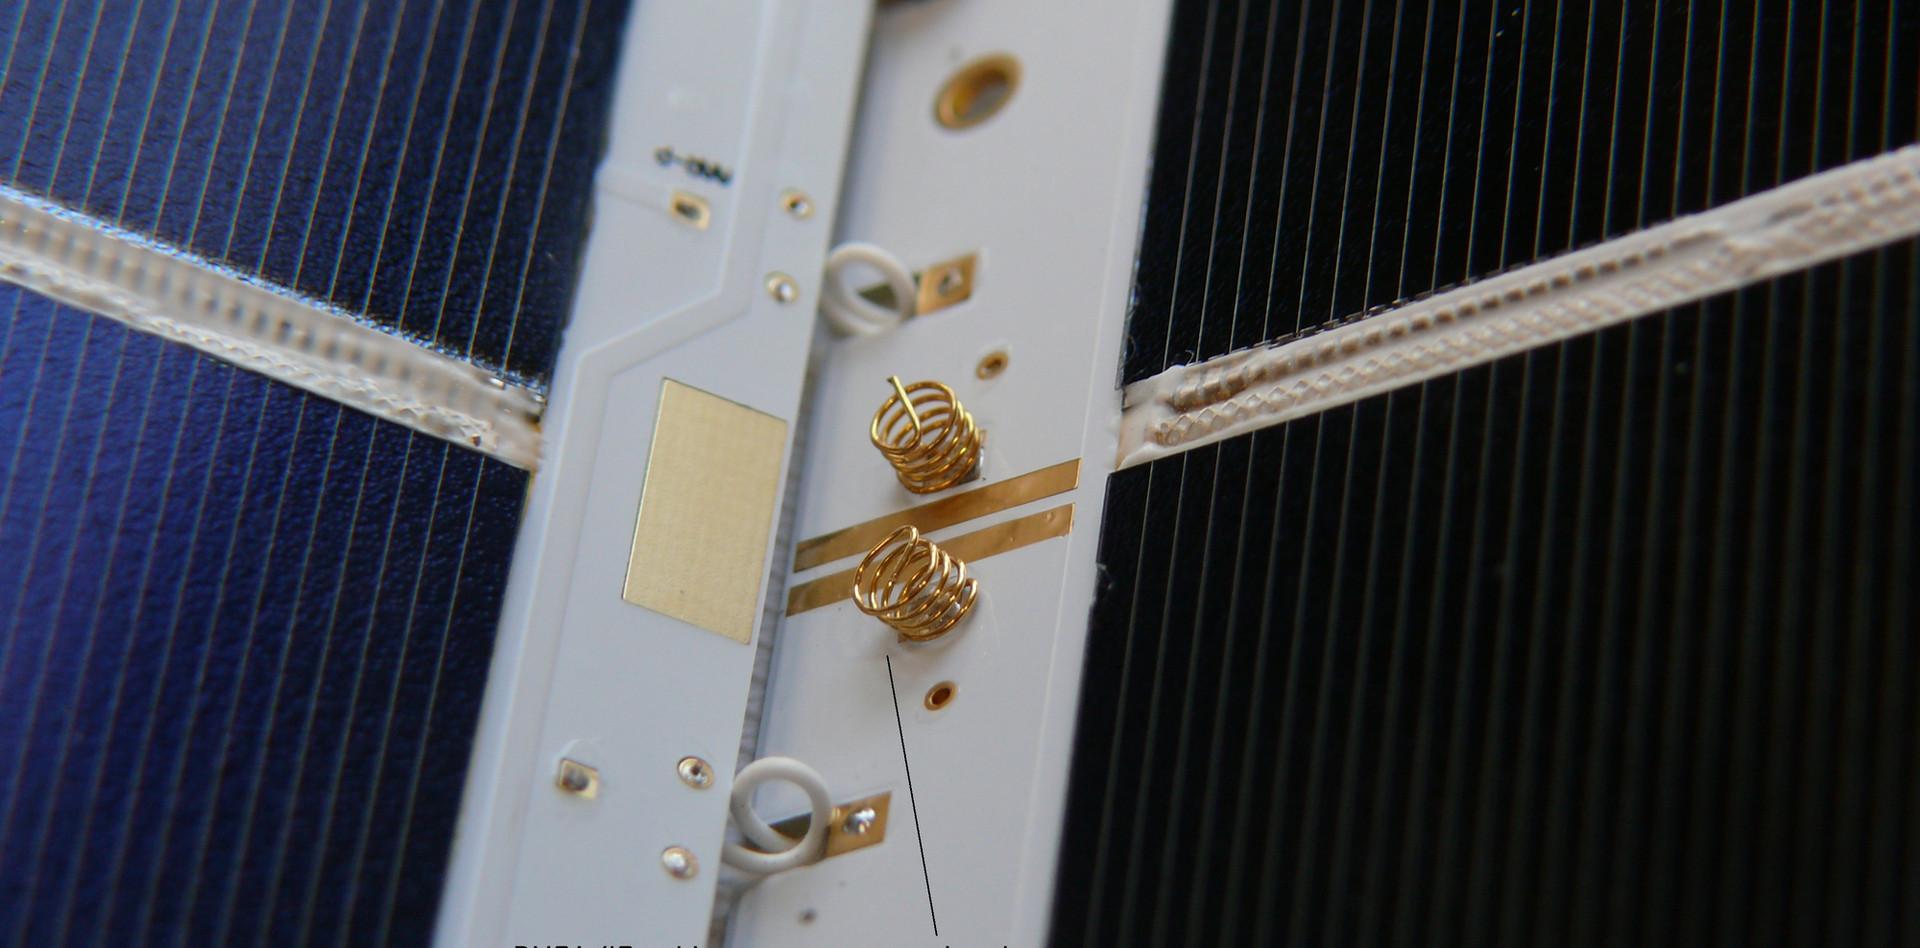 DMSA Deployable Multifunction Solar Array